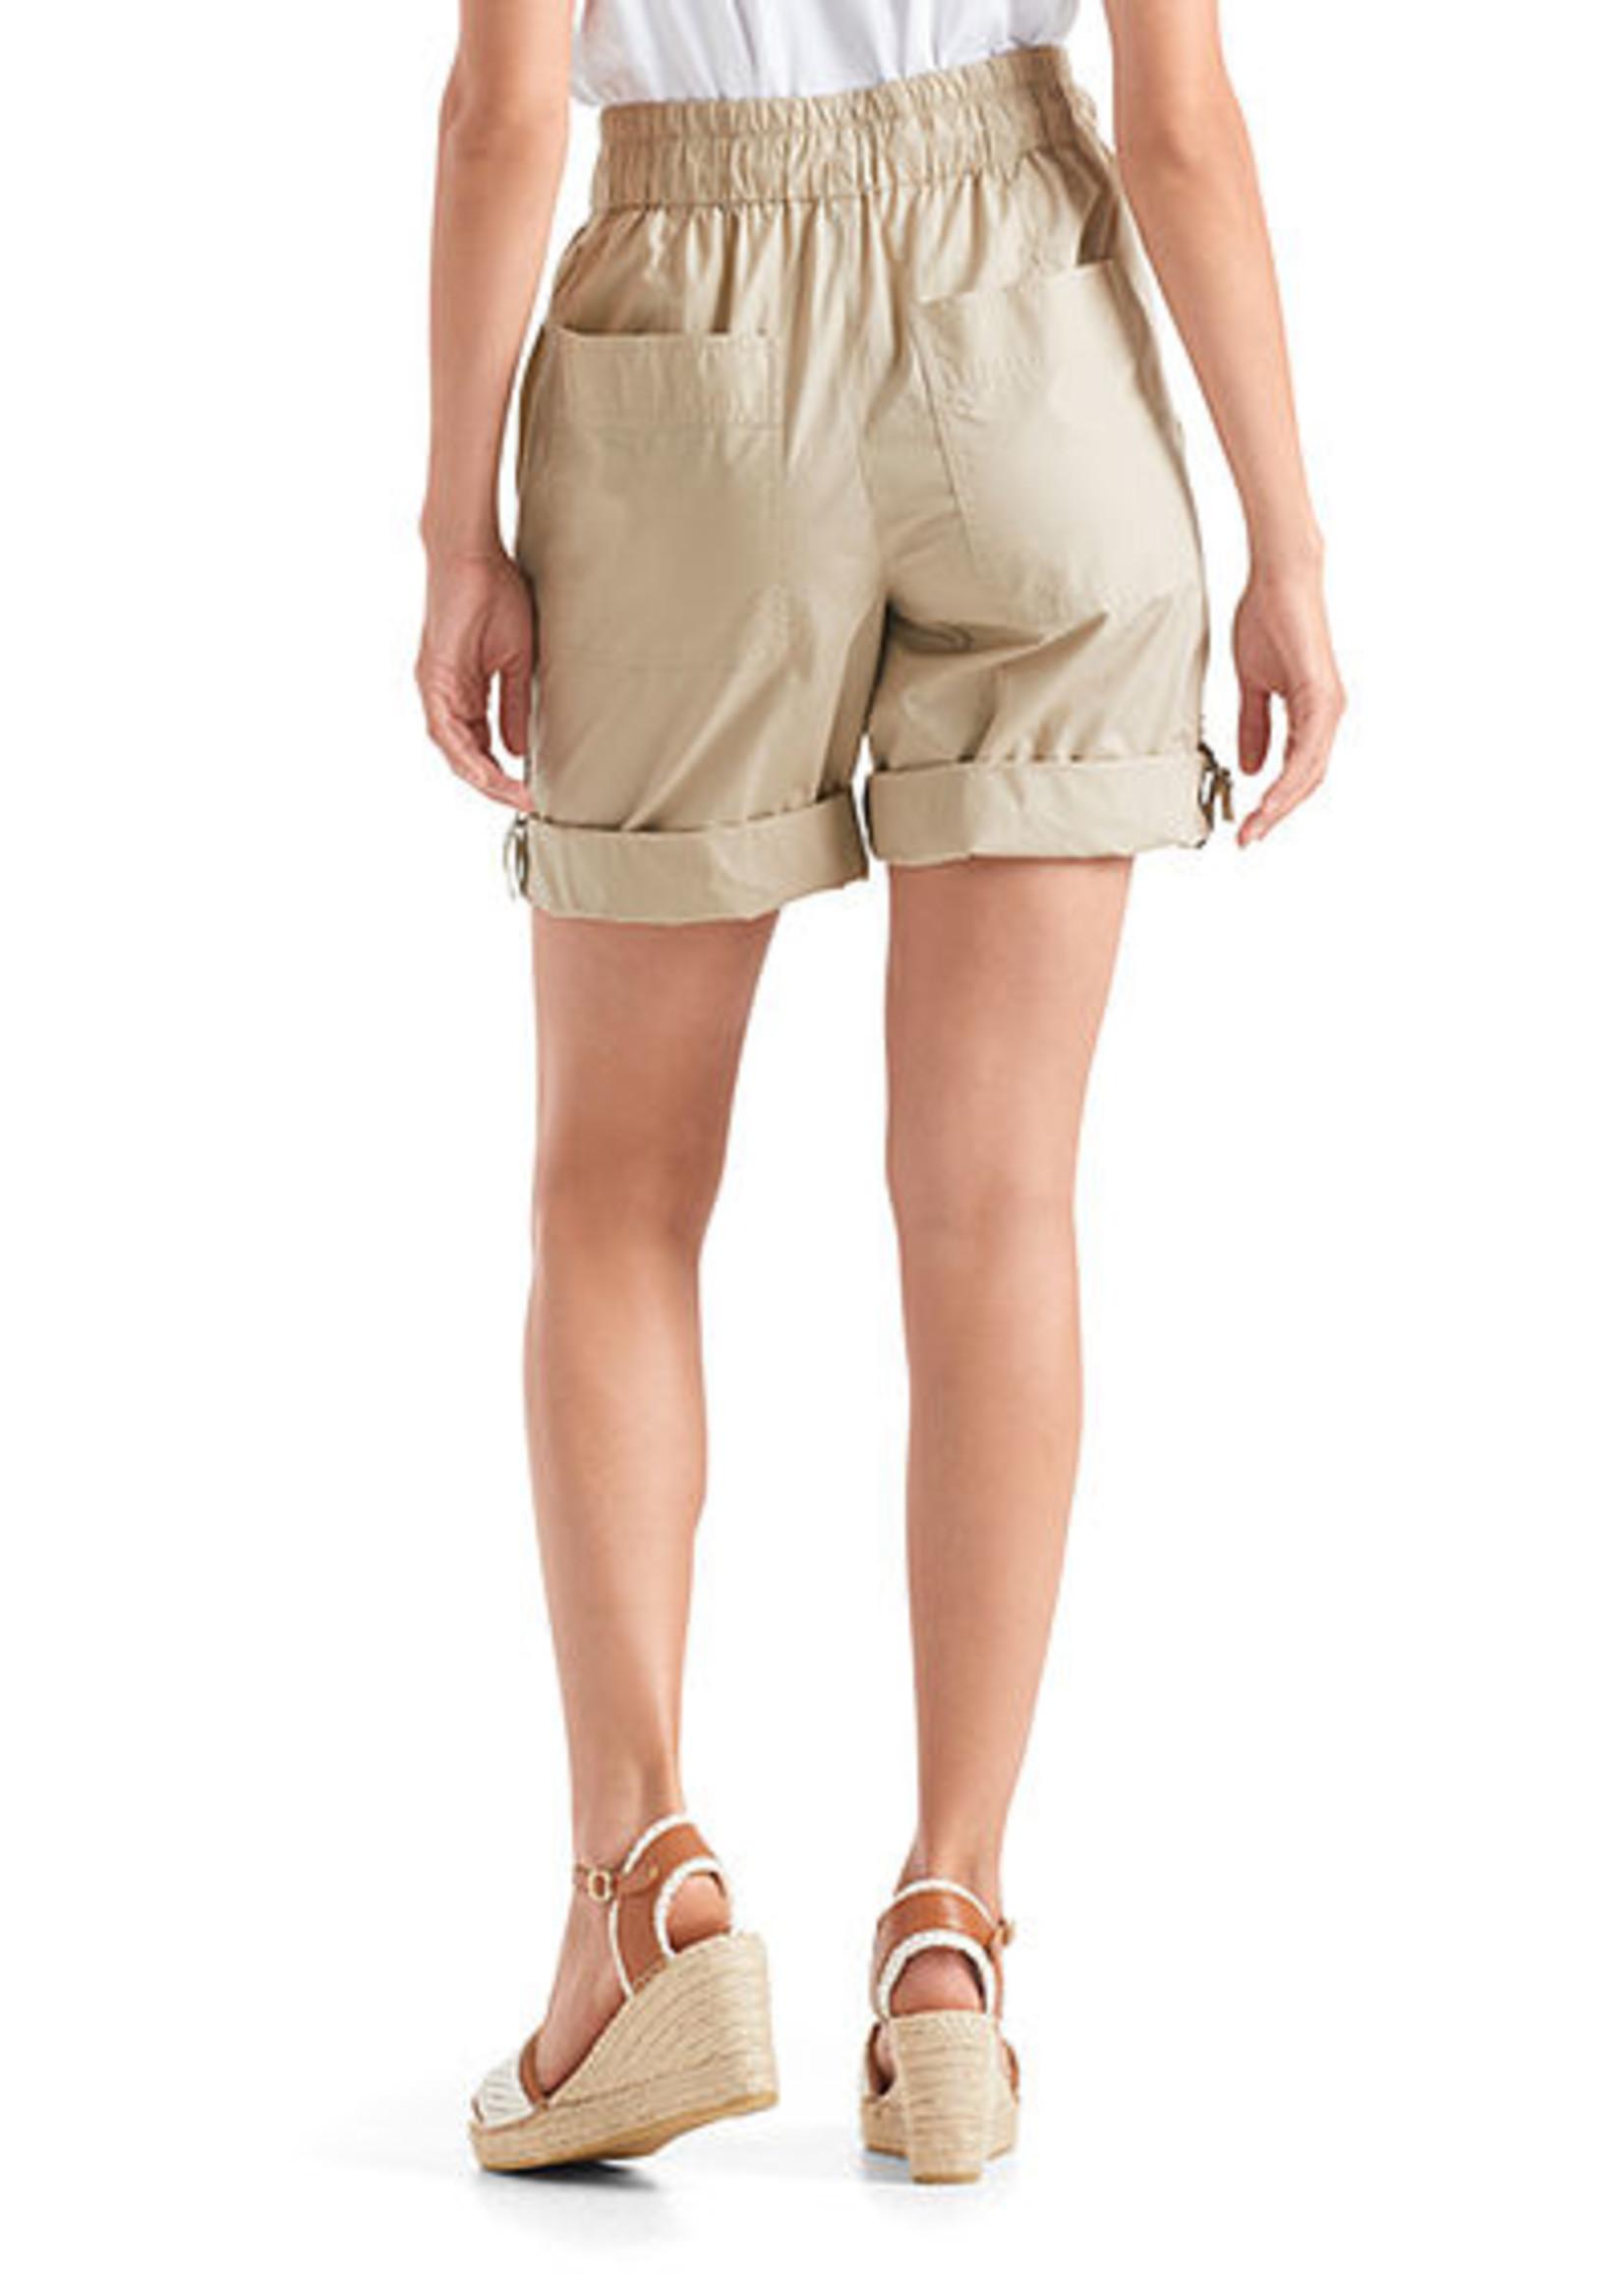 Shorts QS 83.04 W39